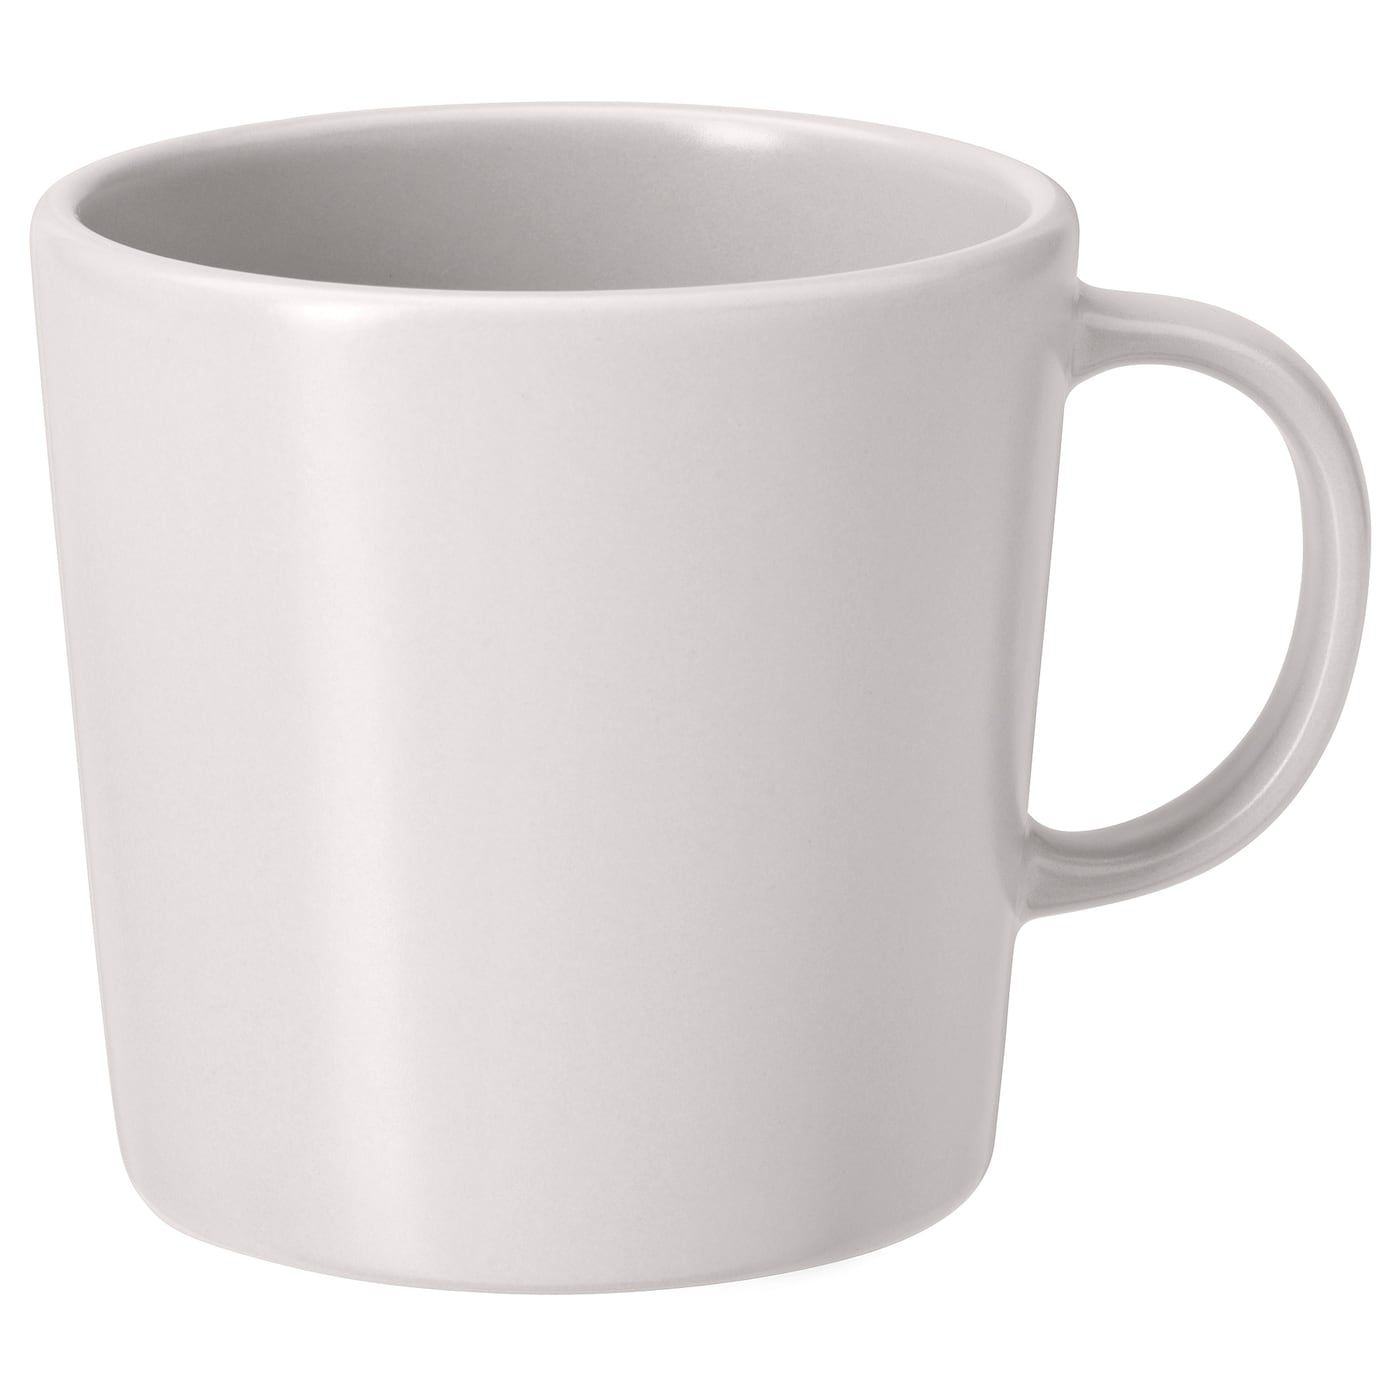 DINERA Mug beige 10 oz in 2020 | Mugs, Ikea, Ikea dinnerware